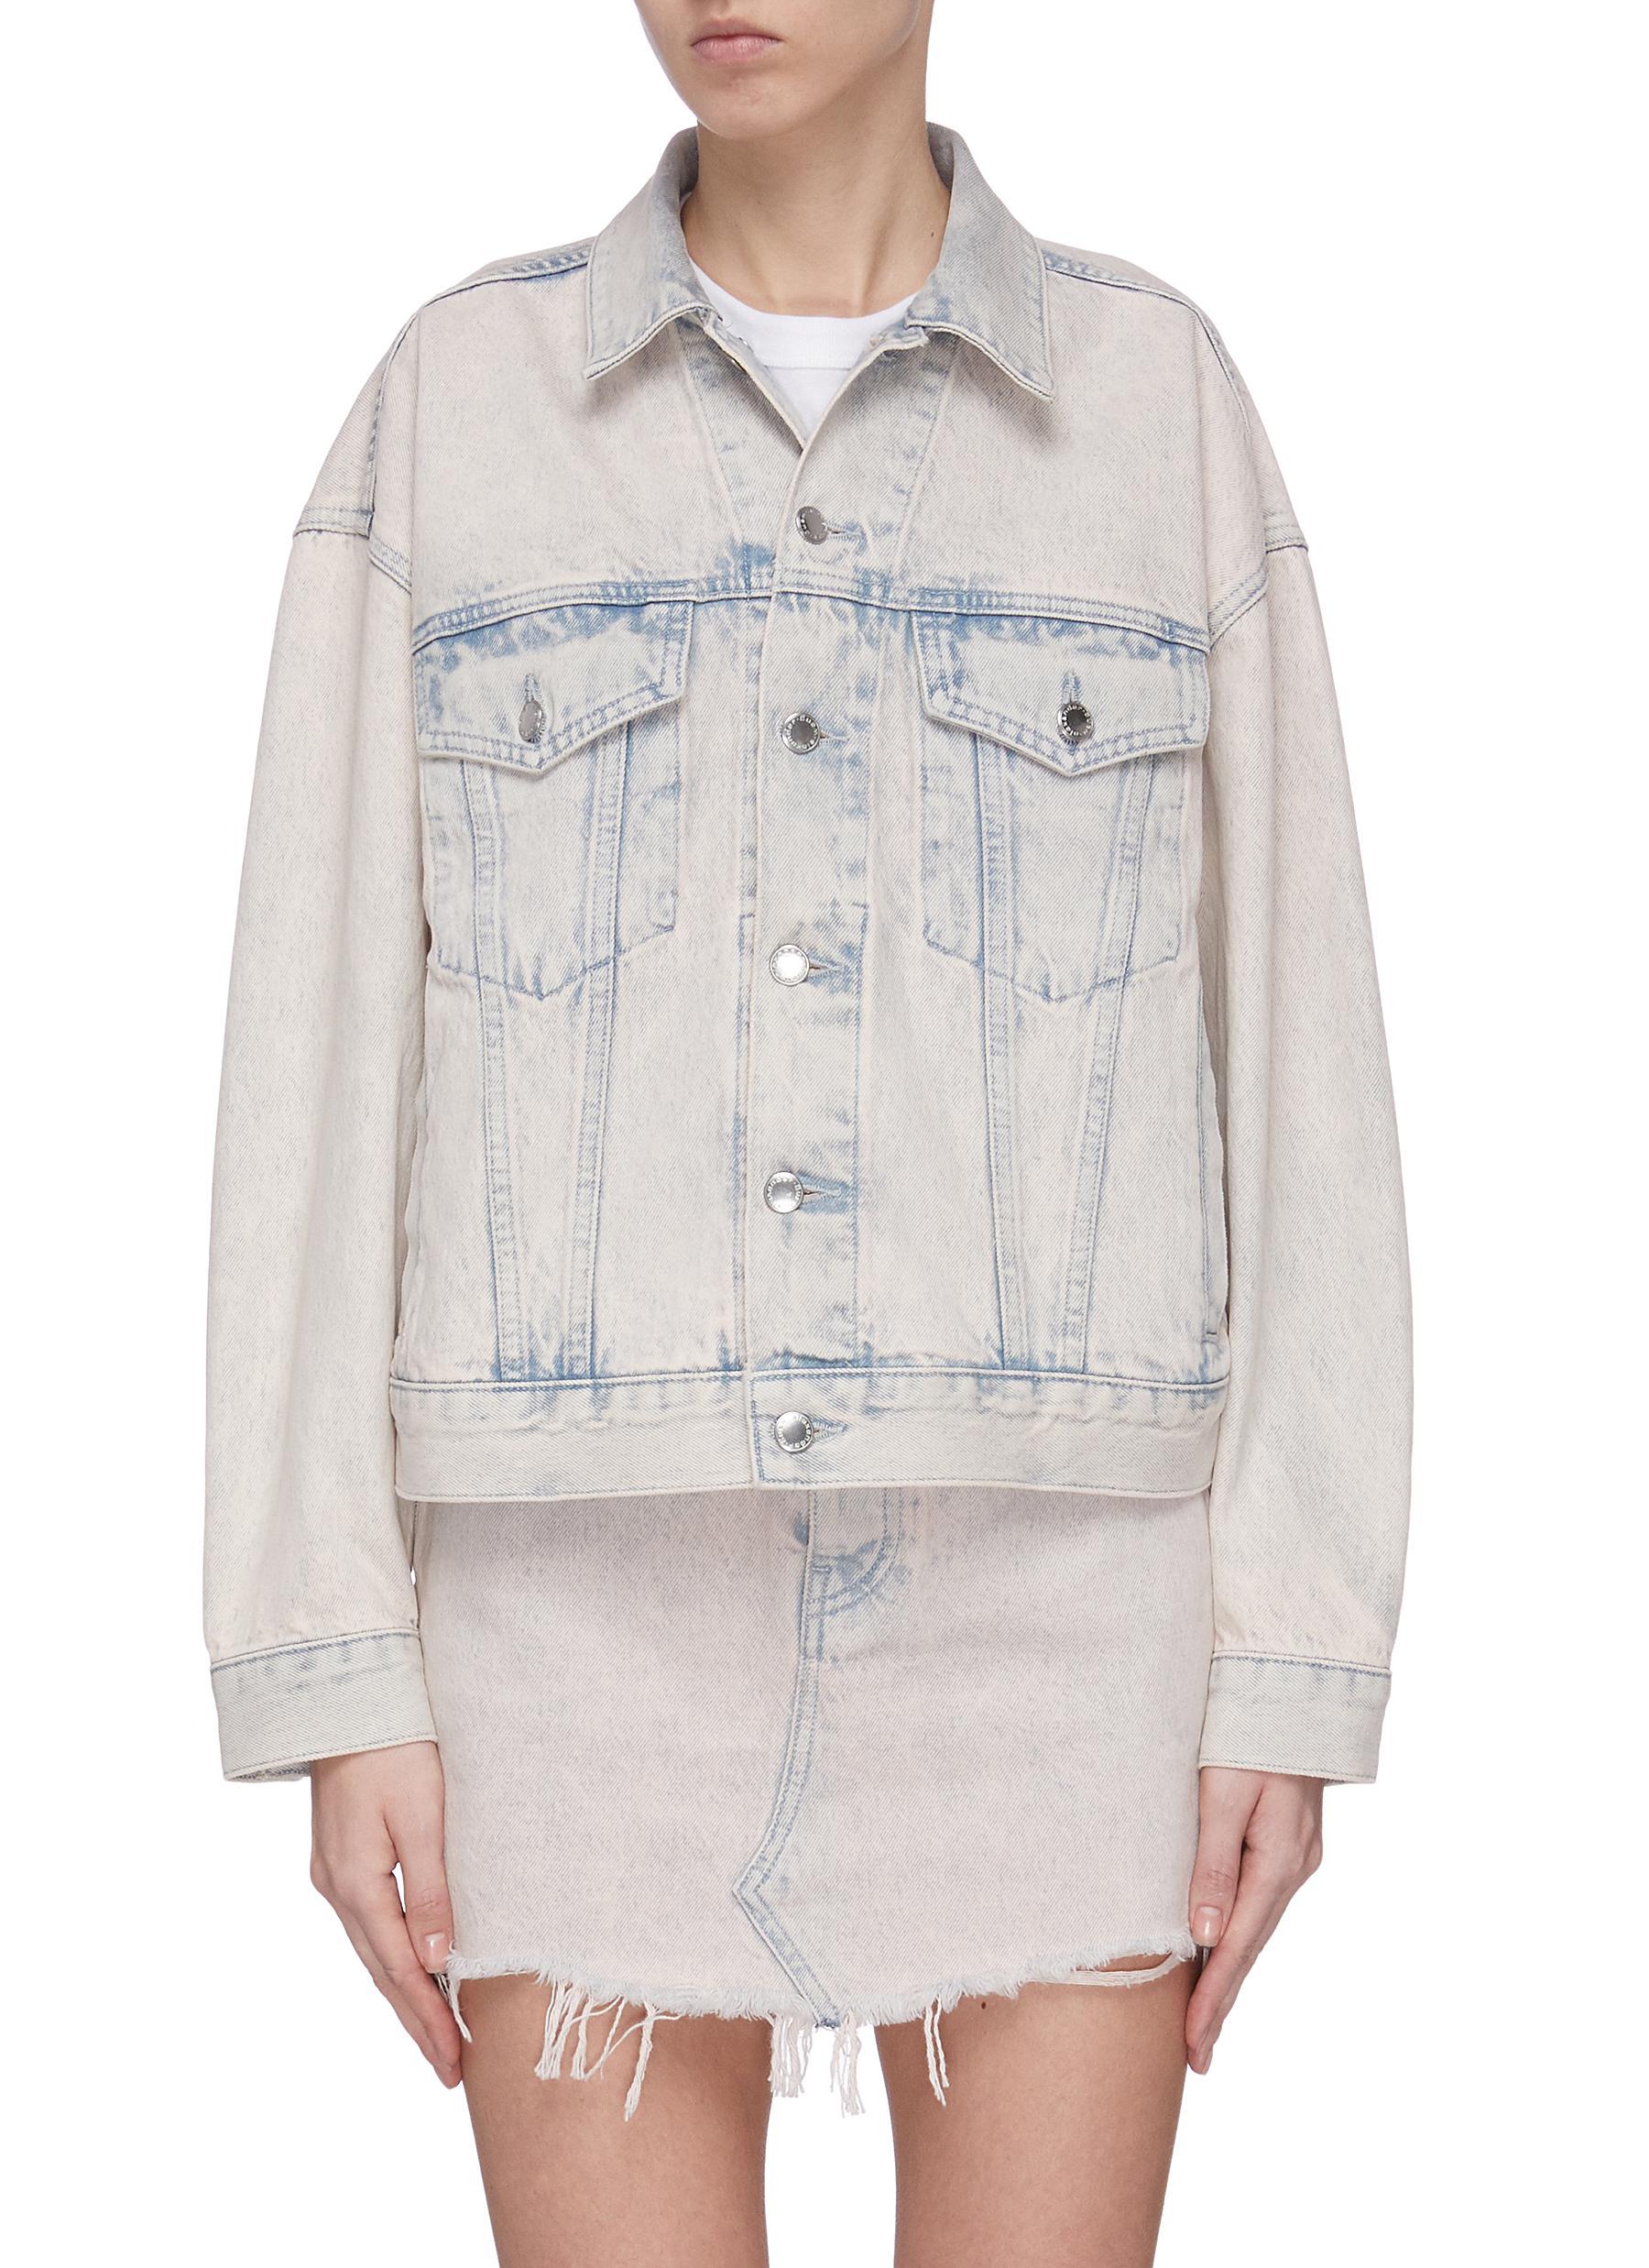 Buy Alexander Wang Jackets 'Game' acid wash denim jacket